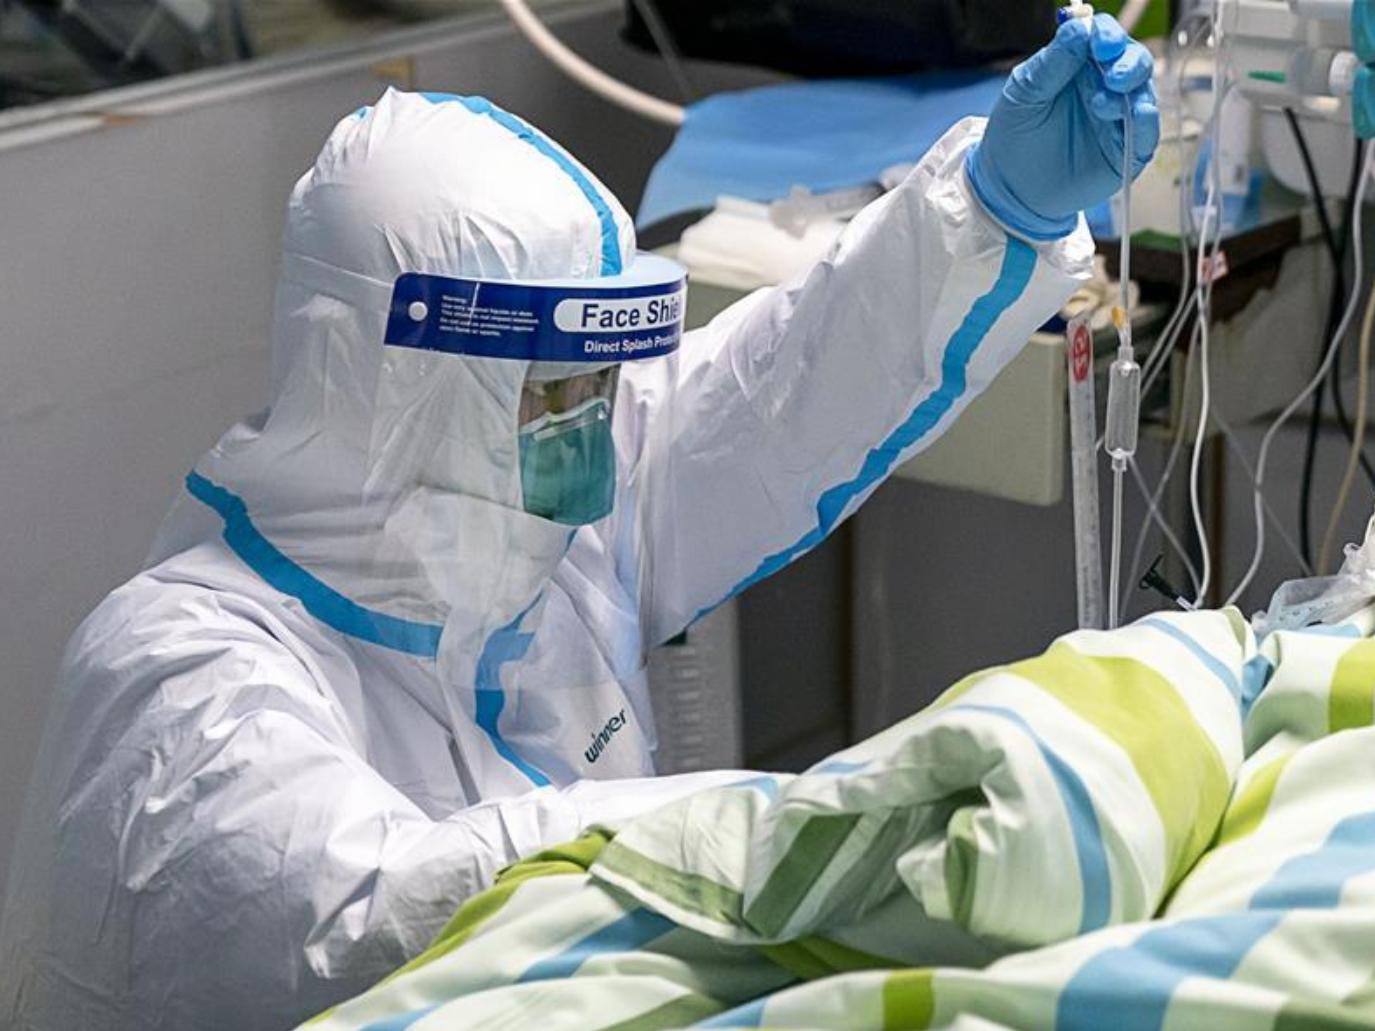 China reports 1,287 confirmed cases of new coronavirus pneumonia, 41 deaths